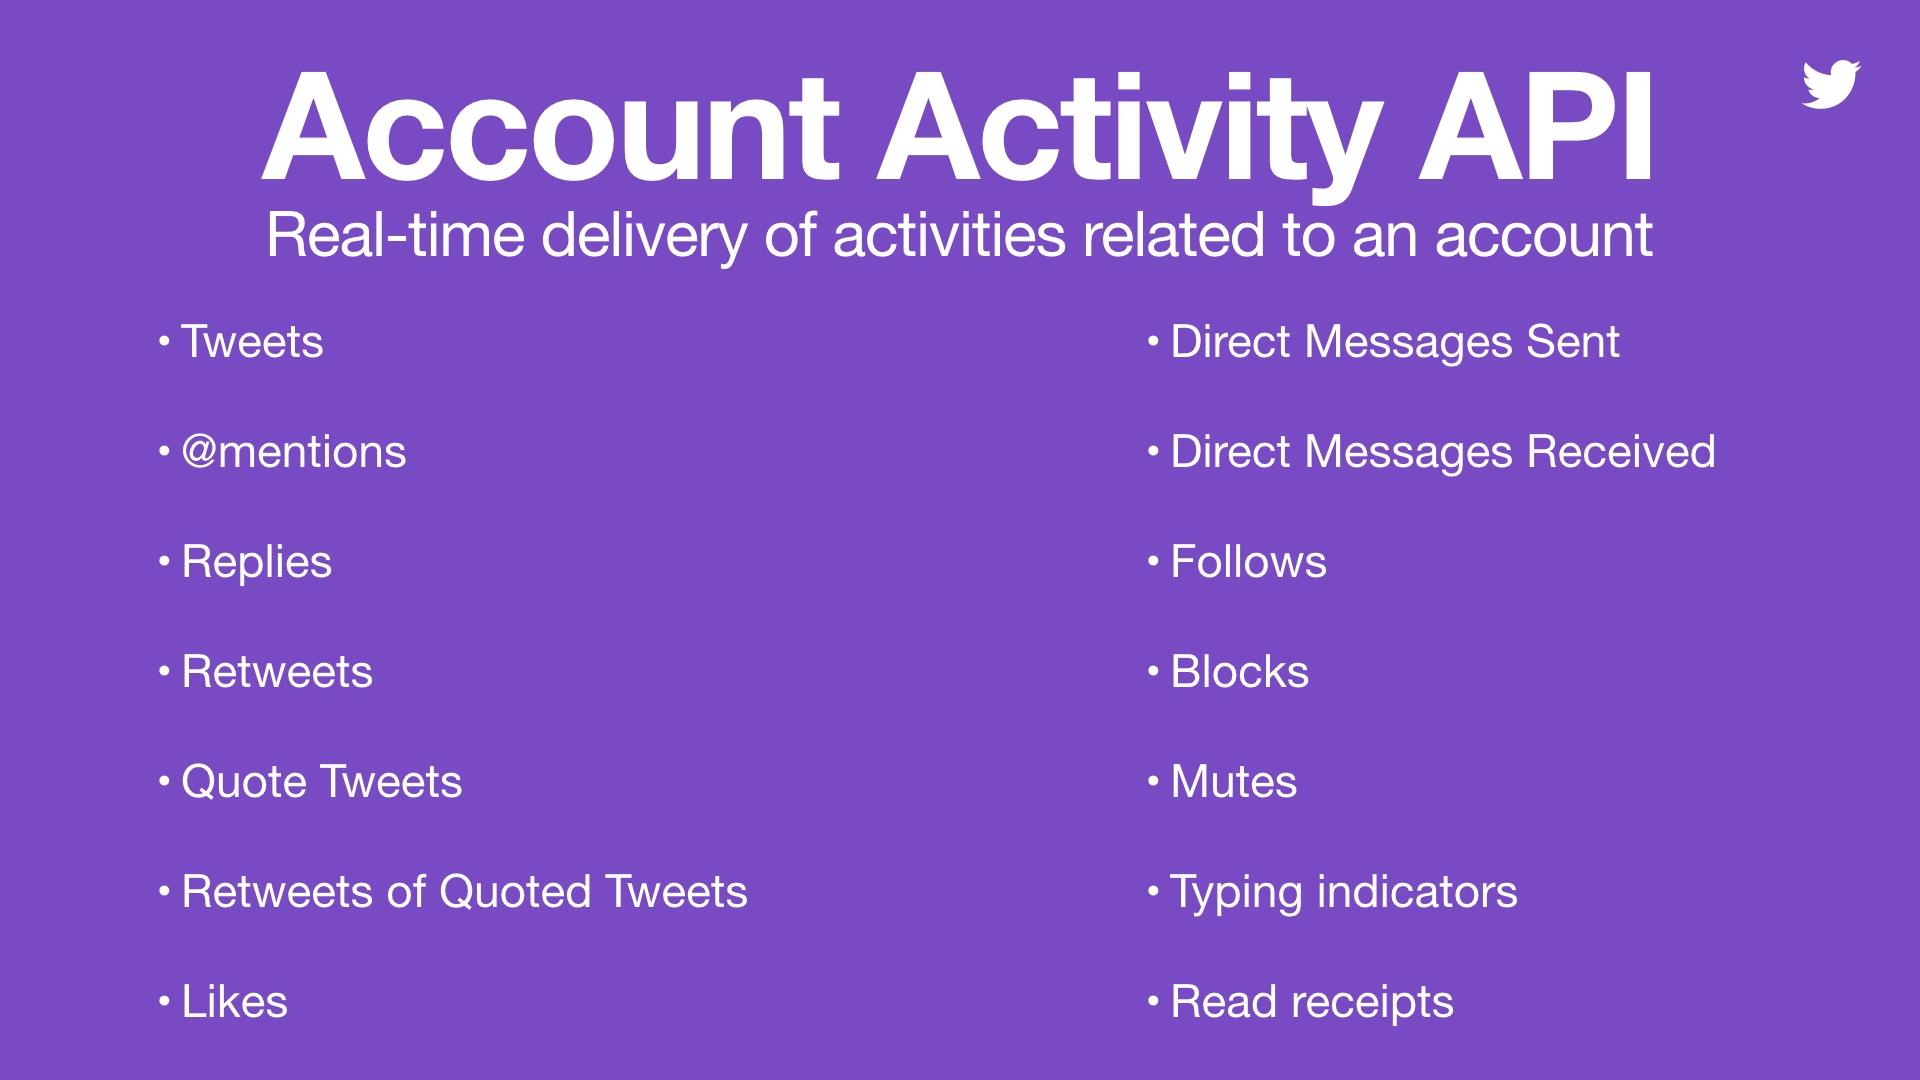 accountactivityapi